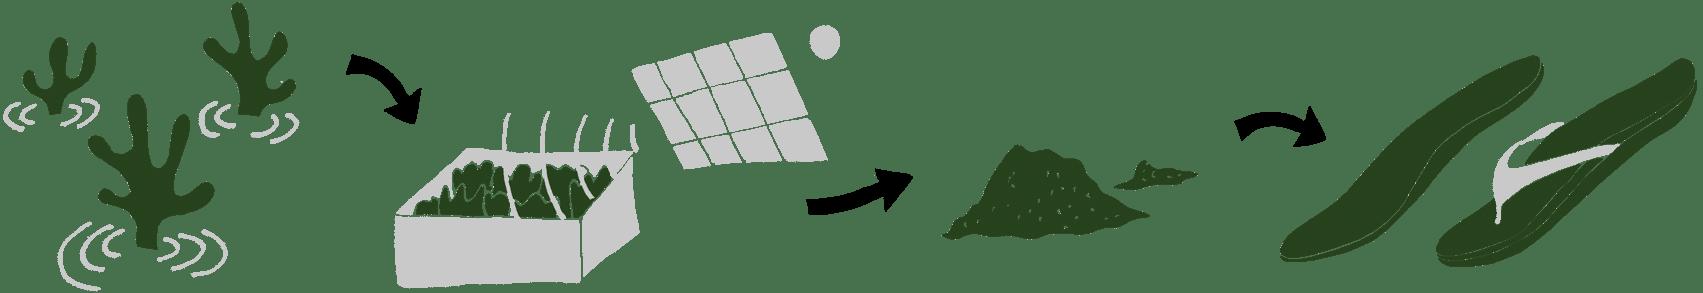 Bloom Foam Algae Sustainable Material Process